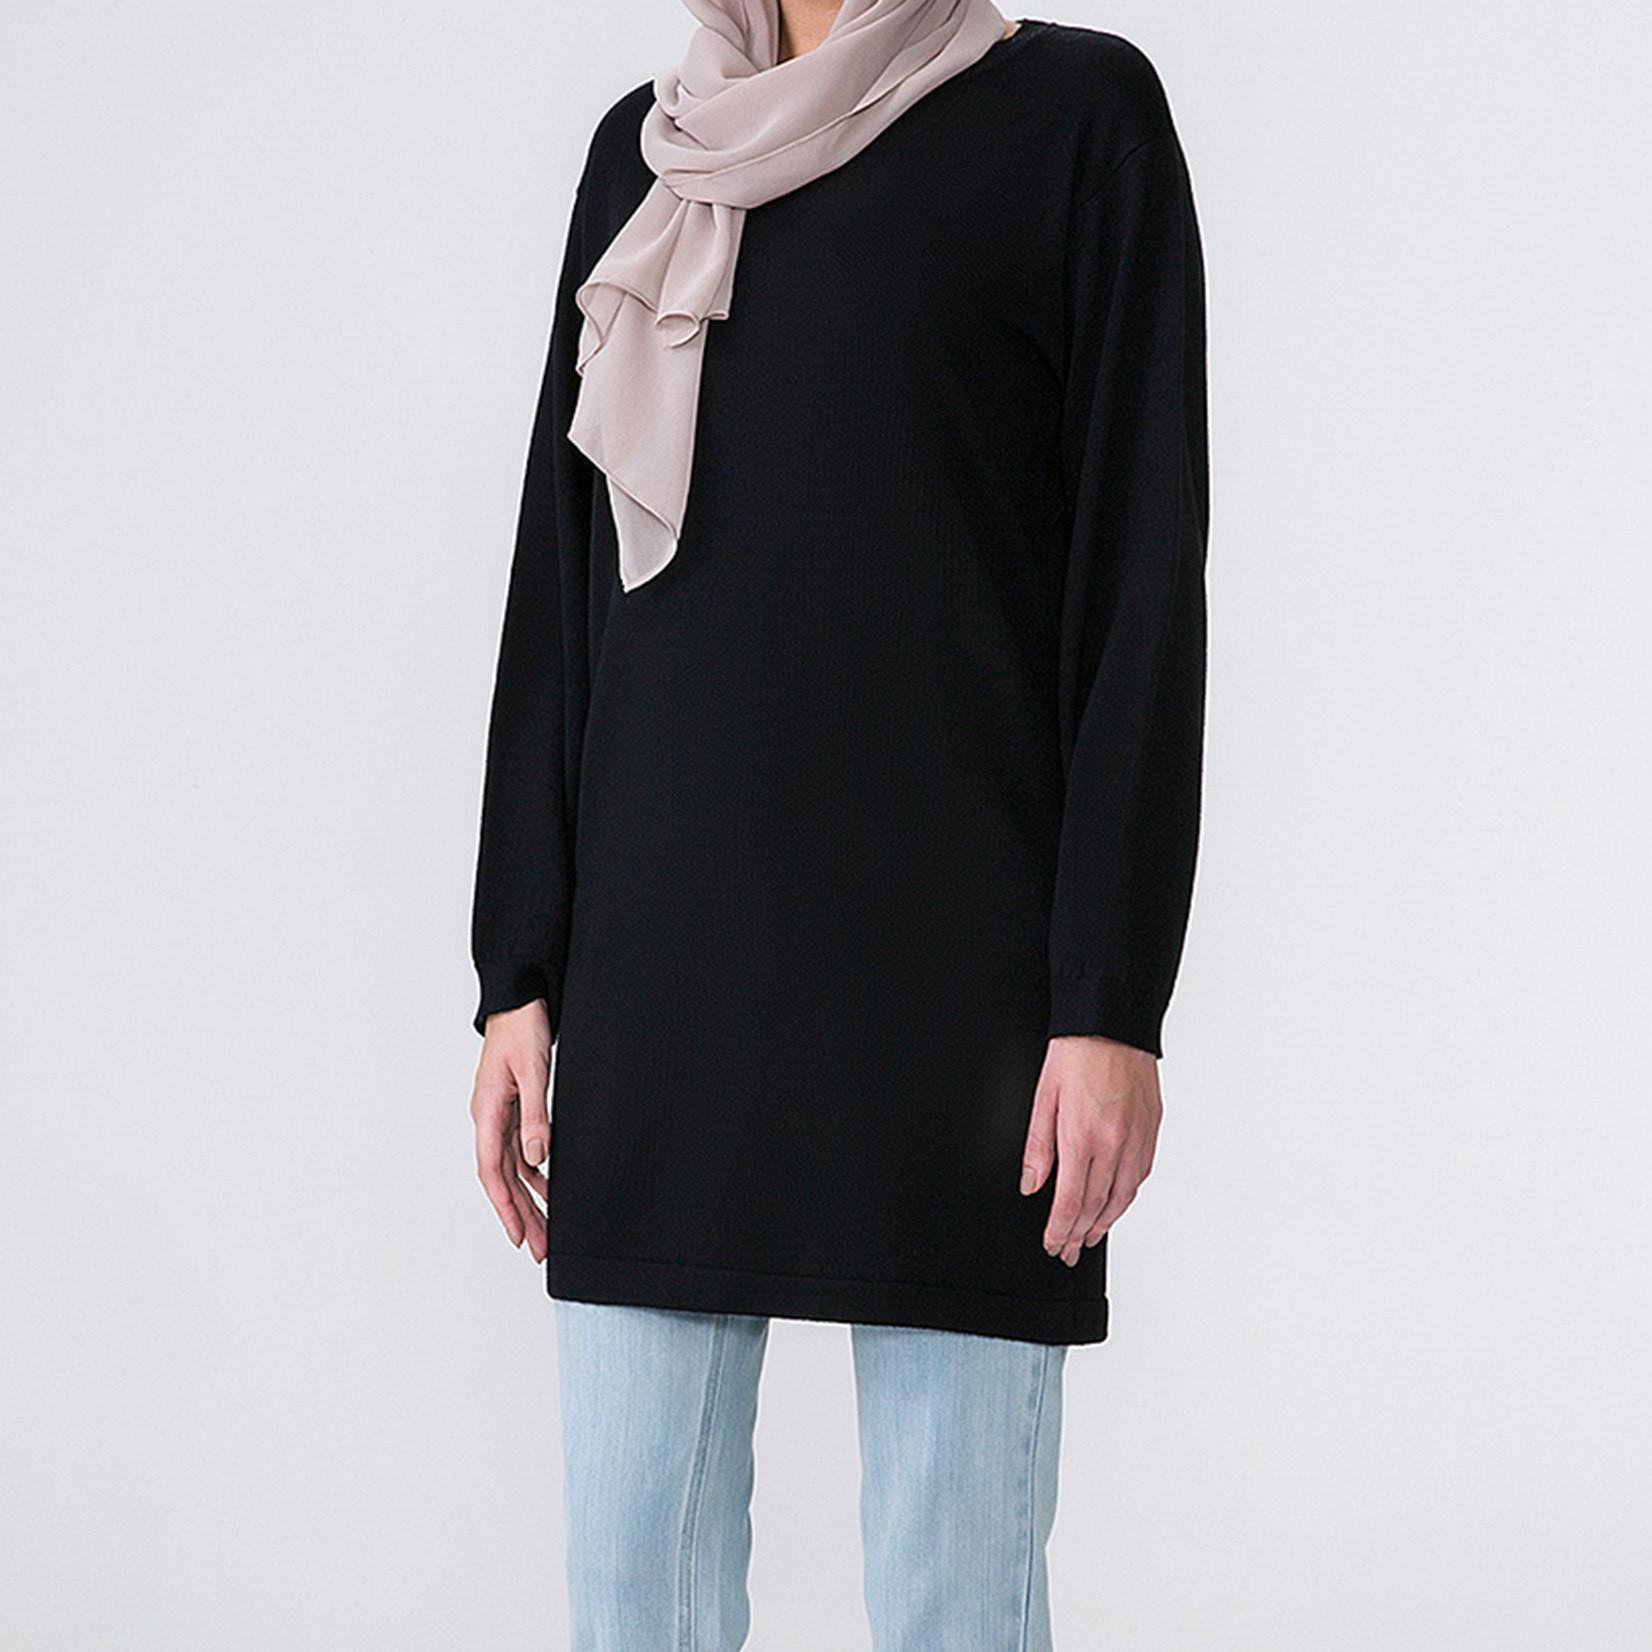 Hijab House Black Long Knit Top